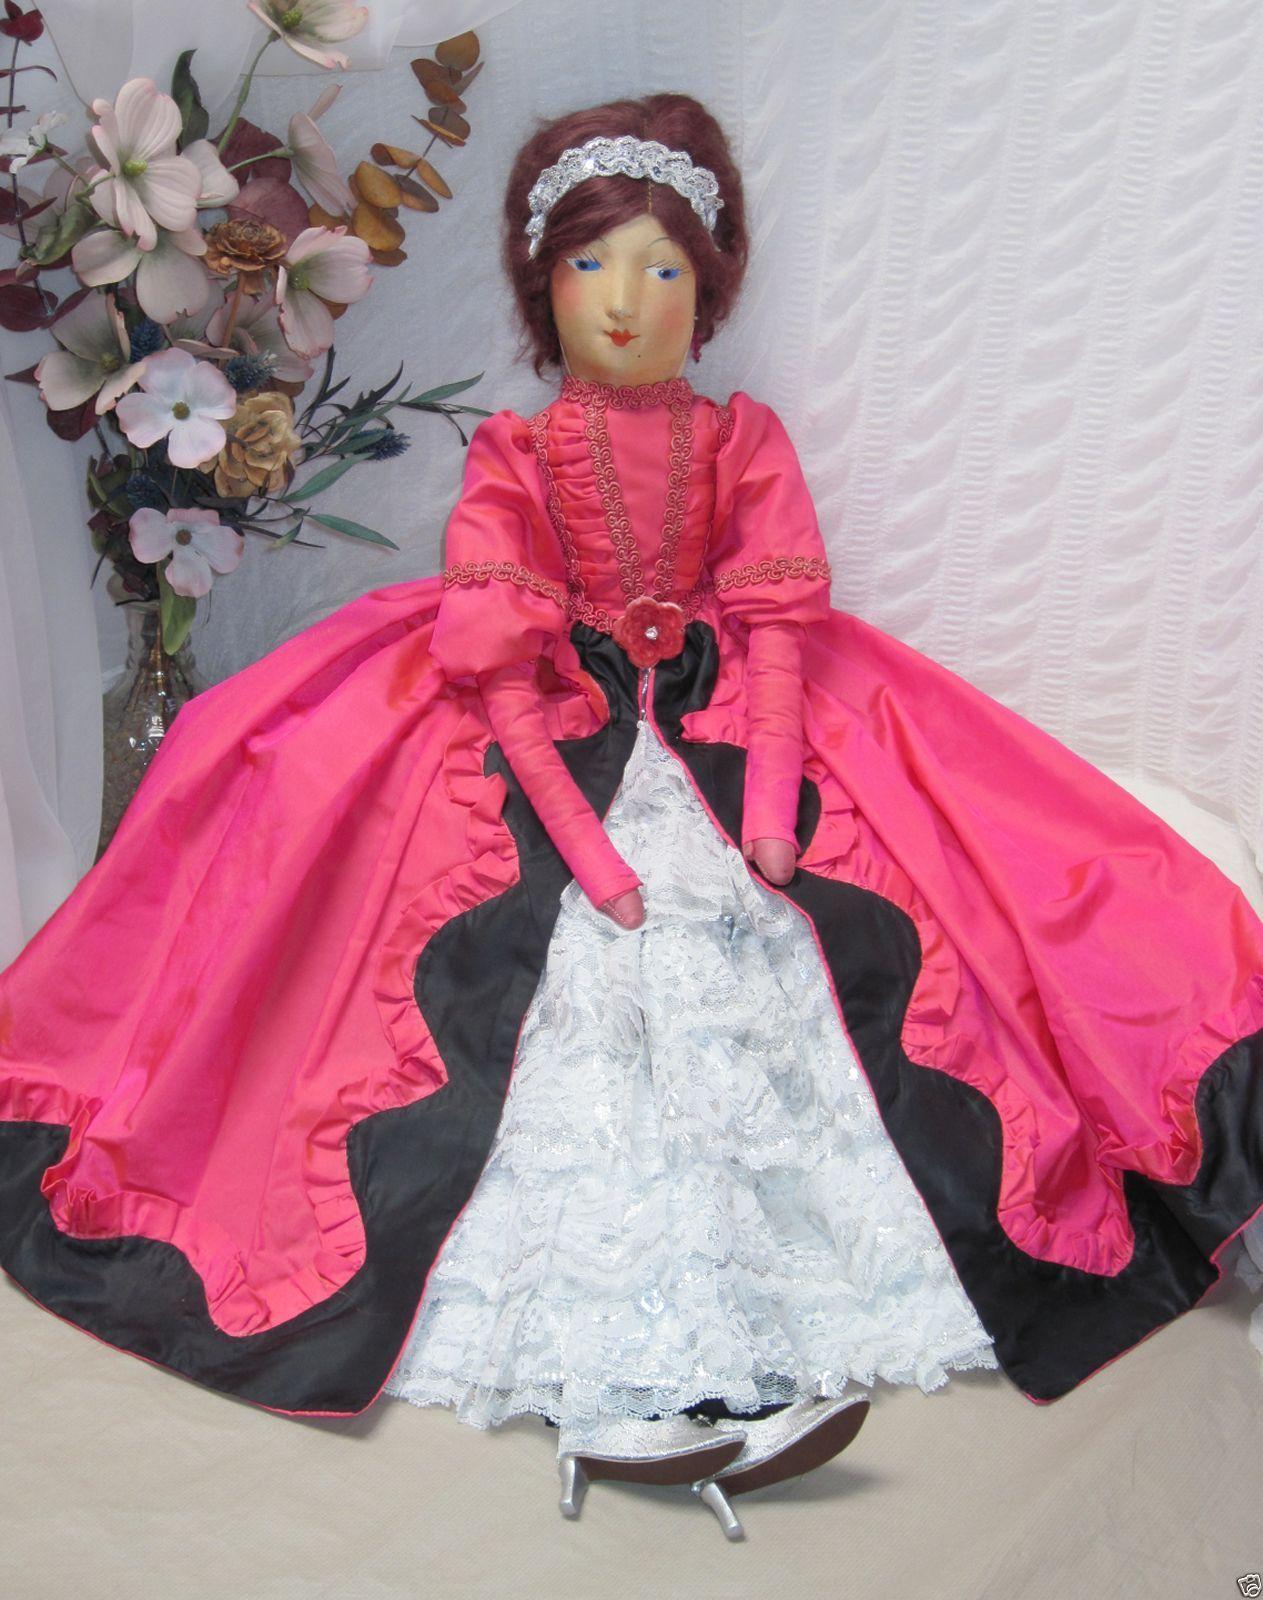 Vintage Boudoir Bed Egghead Doll Molded Cloth Face Body Unique Novelty Company | eBay